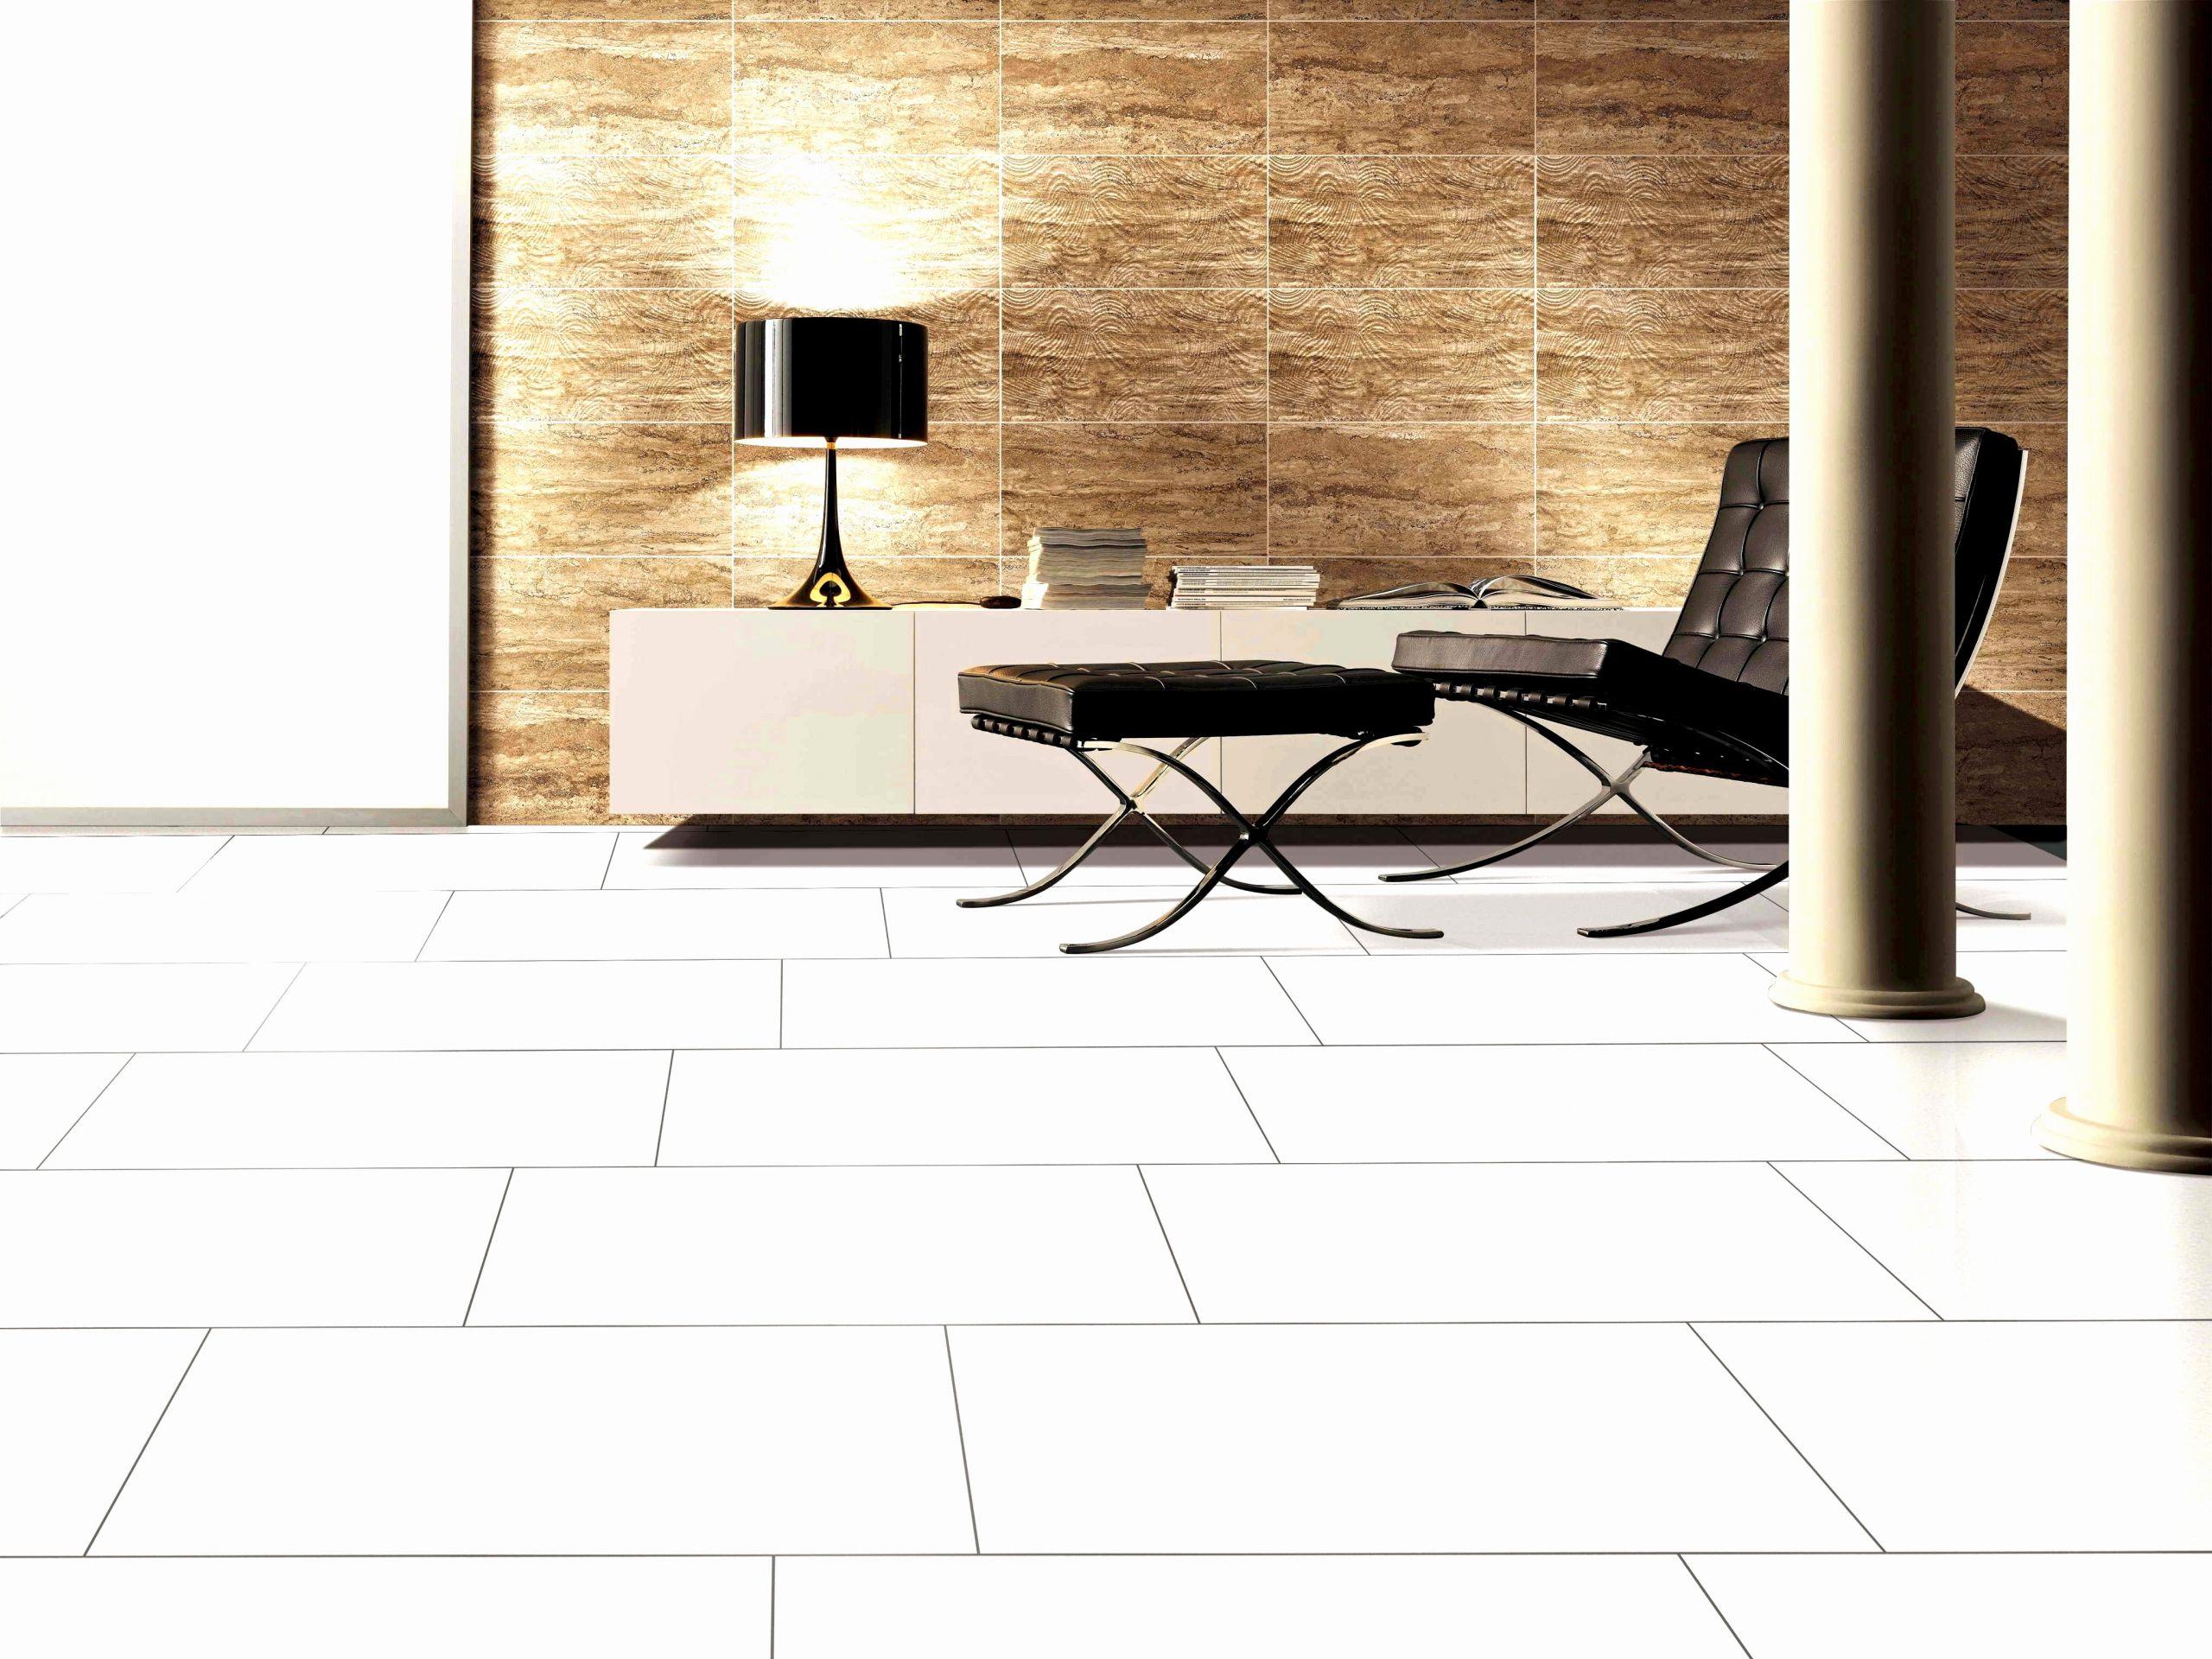 ch hardwood floors of hardwood floor estimate floor plan ideas with regard to elegant luxury new new tile floor heating lovely bmw e87 1er 04 07 120d 2 0d